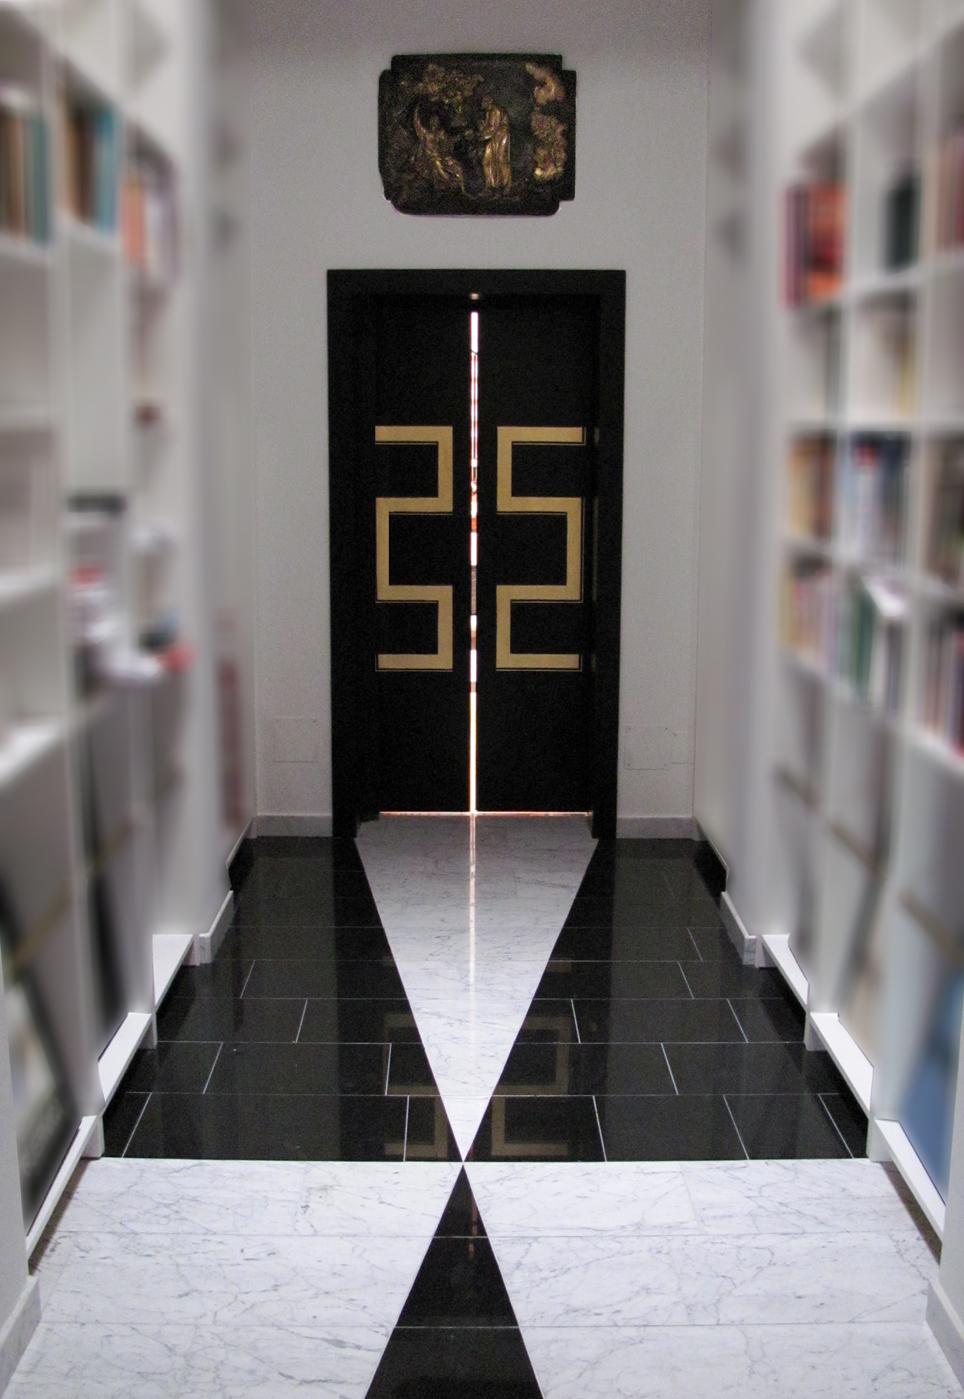 … Octagon Bibliothek …